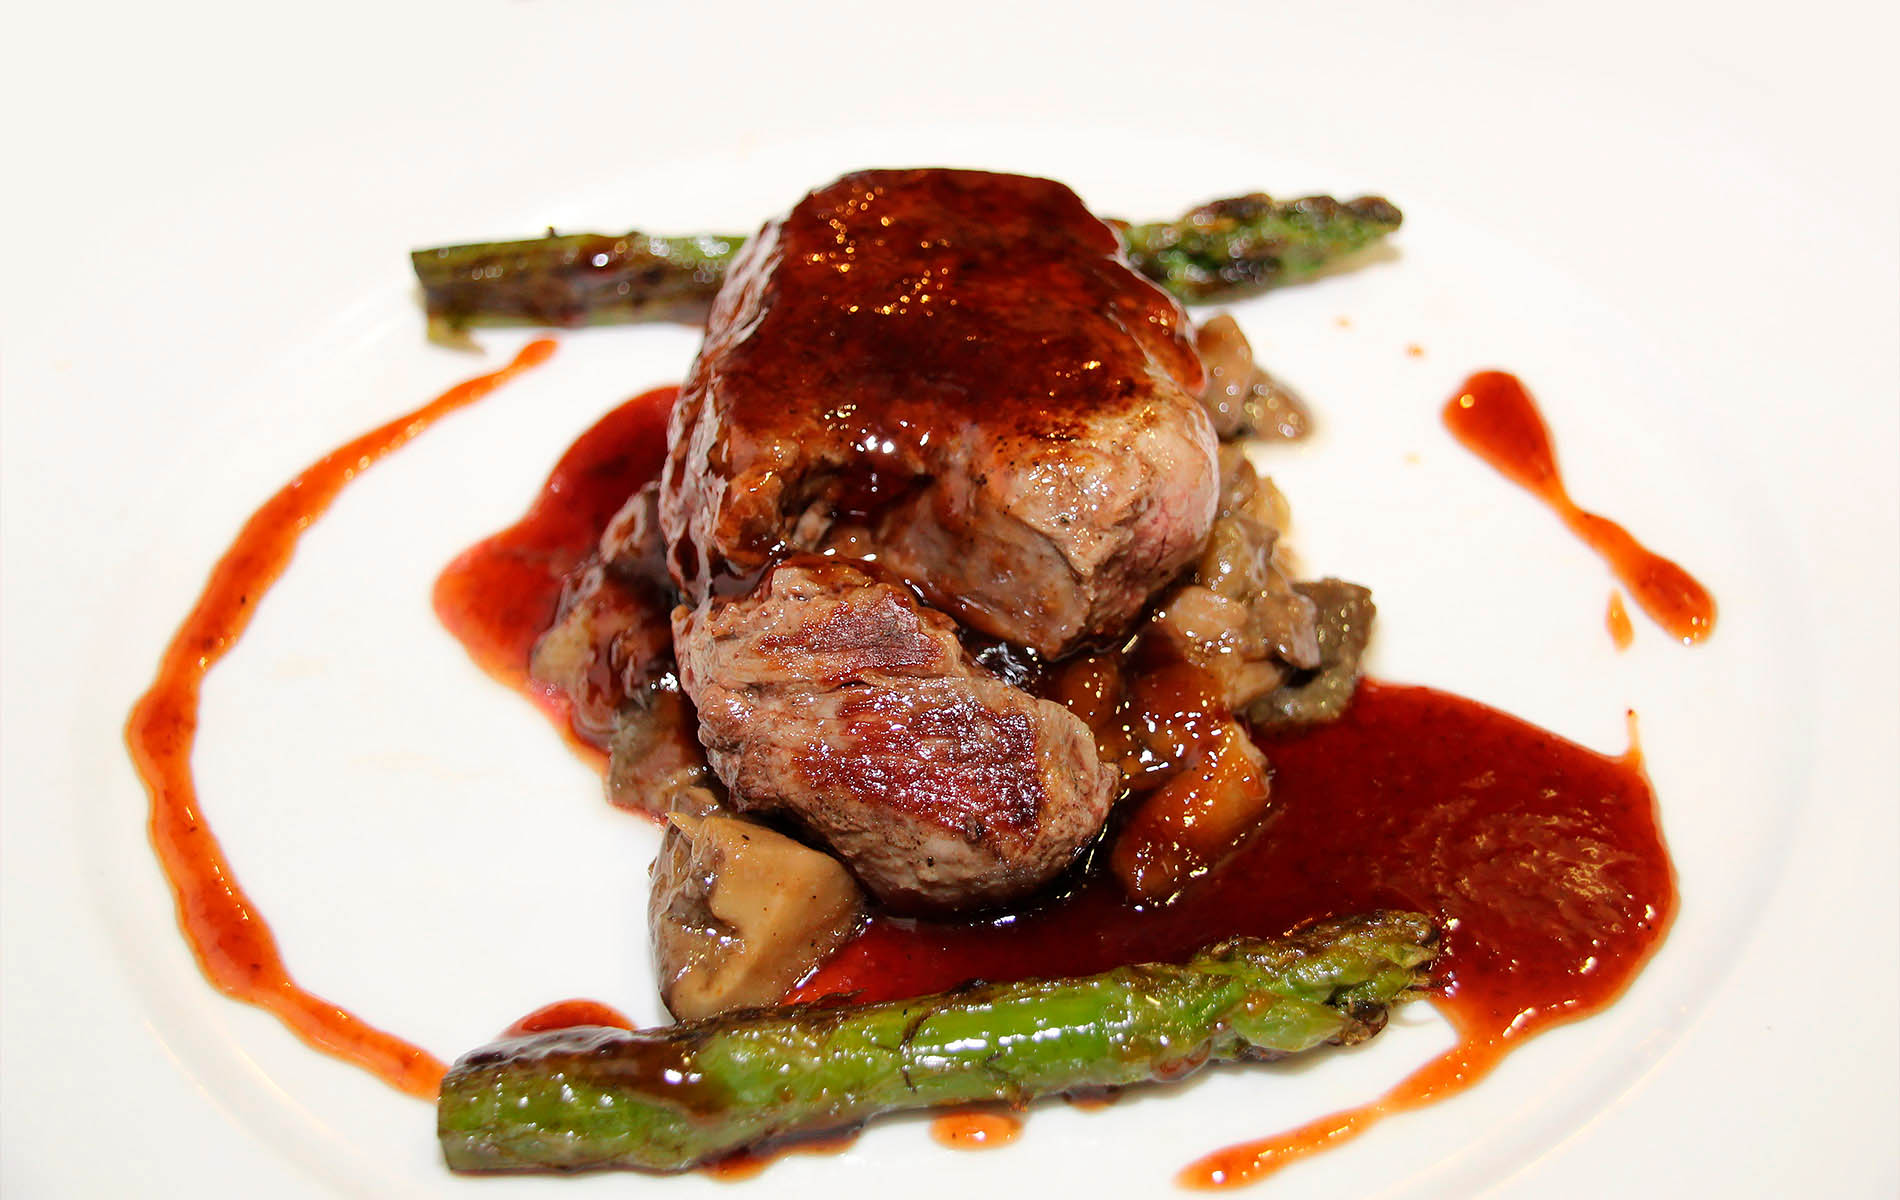 Filete de ternera de Girona con foie fresco y salsa de uvas